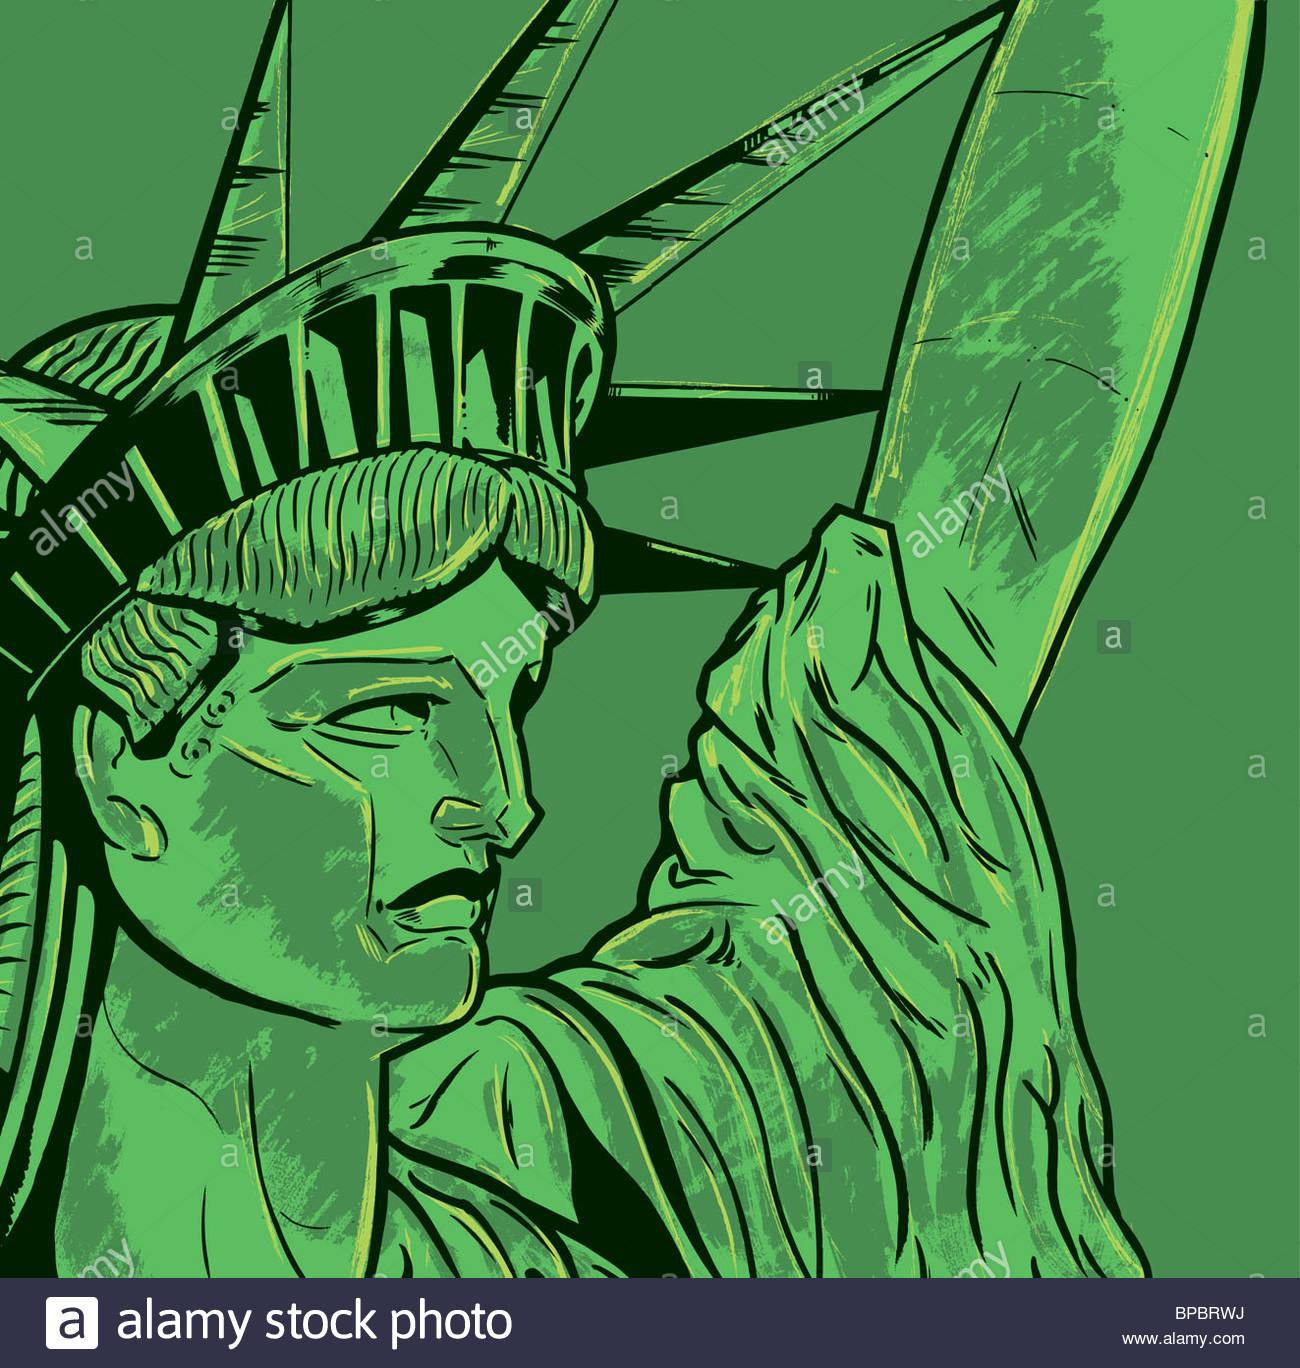 Liberty Statue Drawing Stockfotos & Liberty Statue Drawing Bilder ...